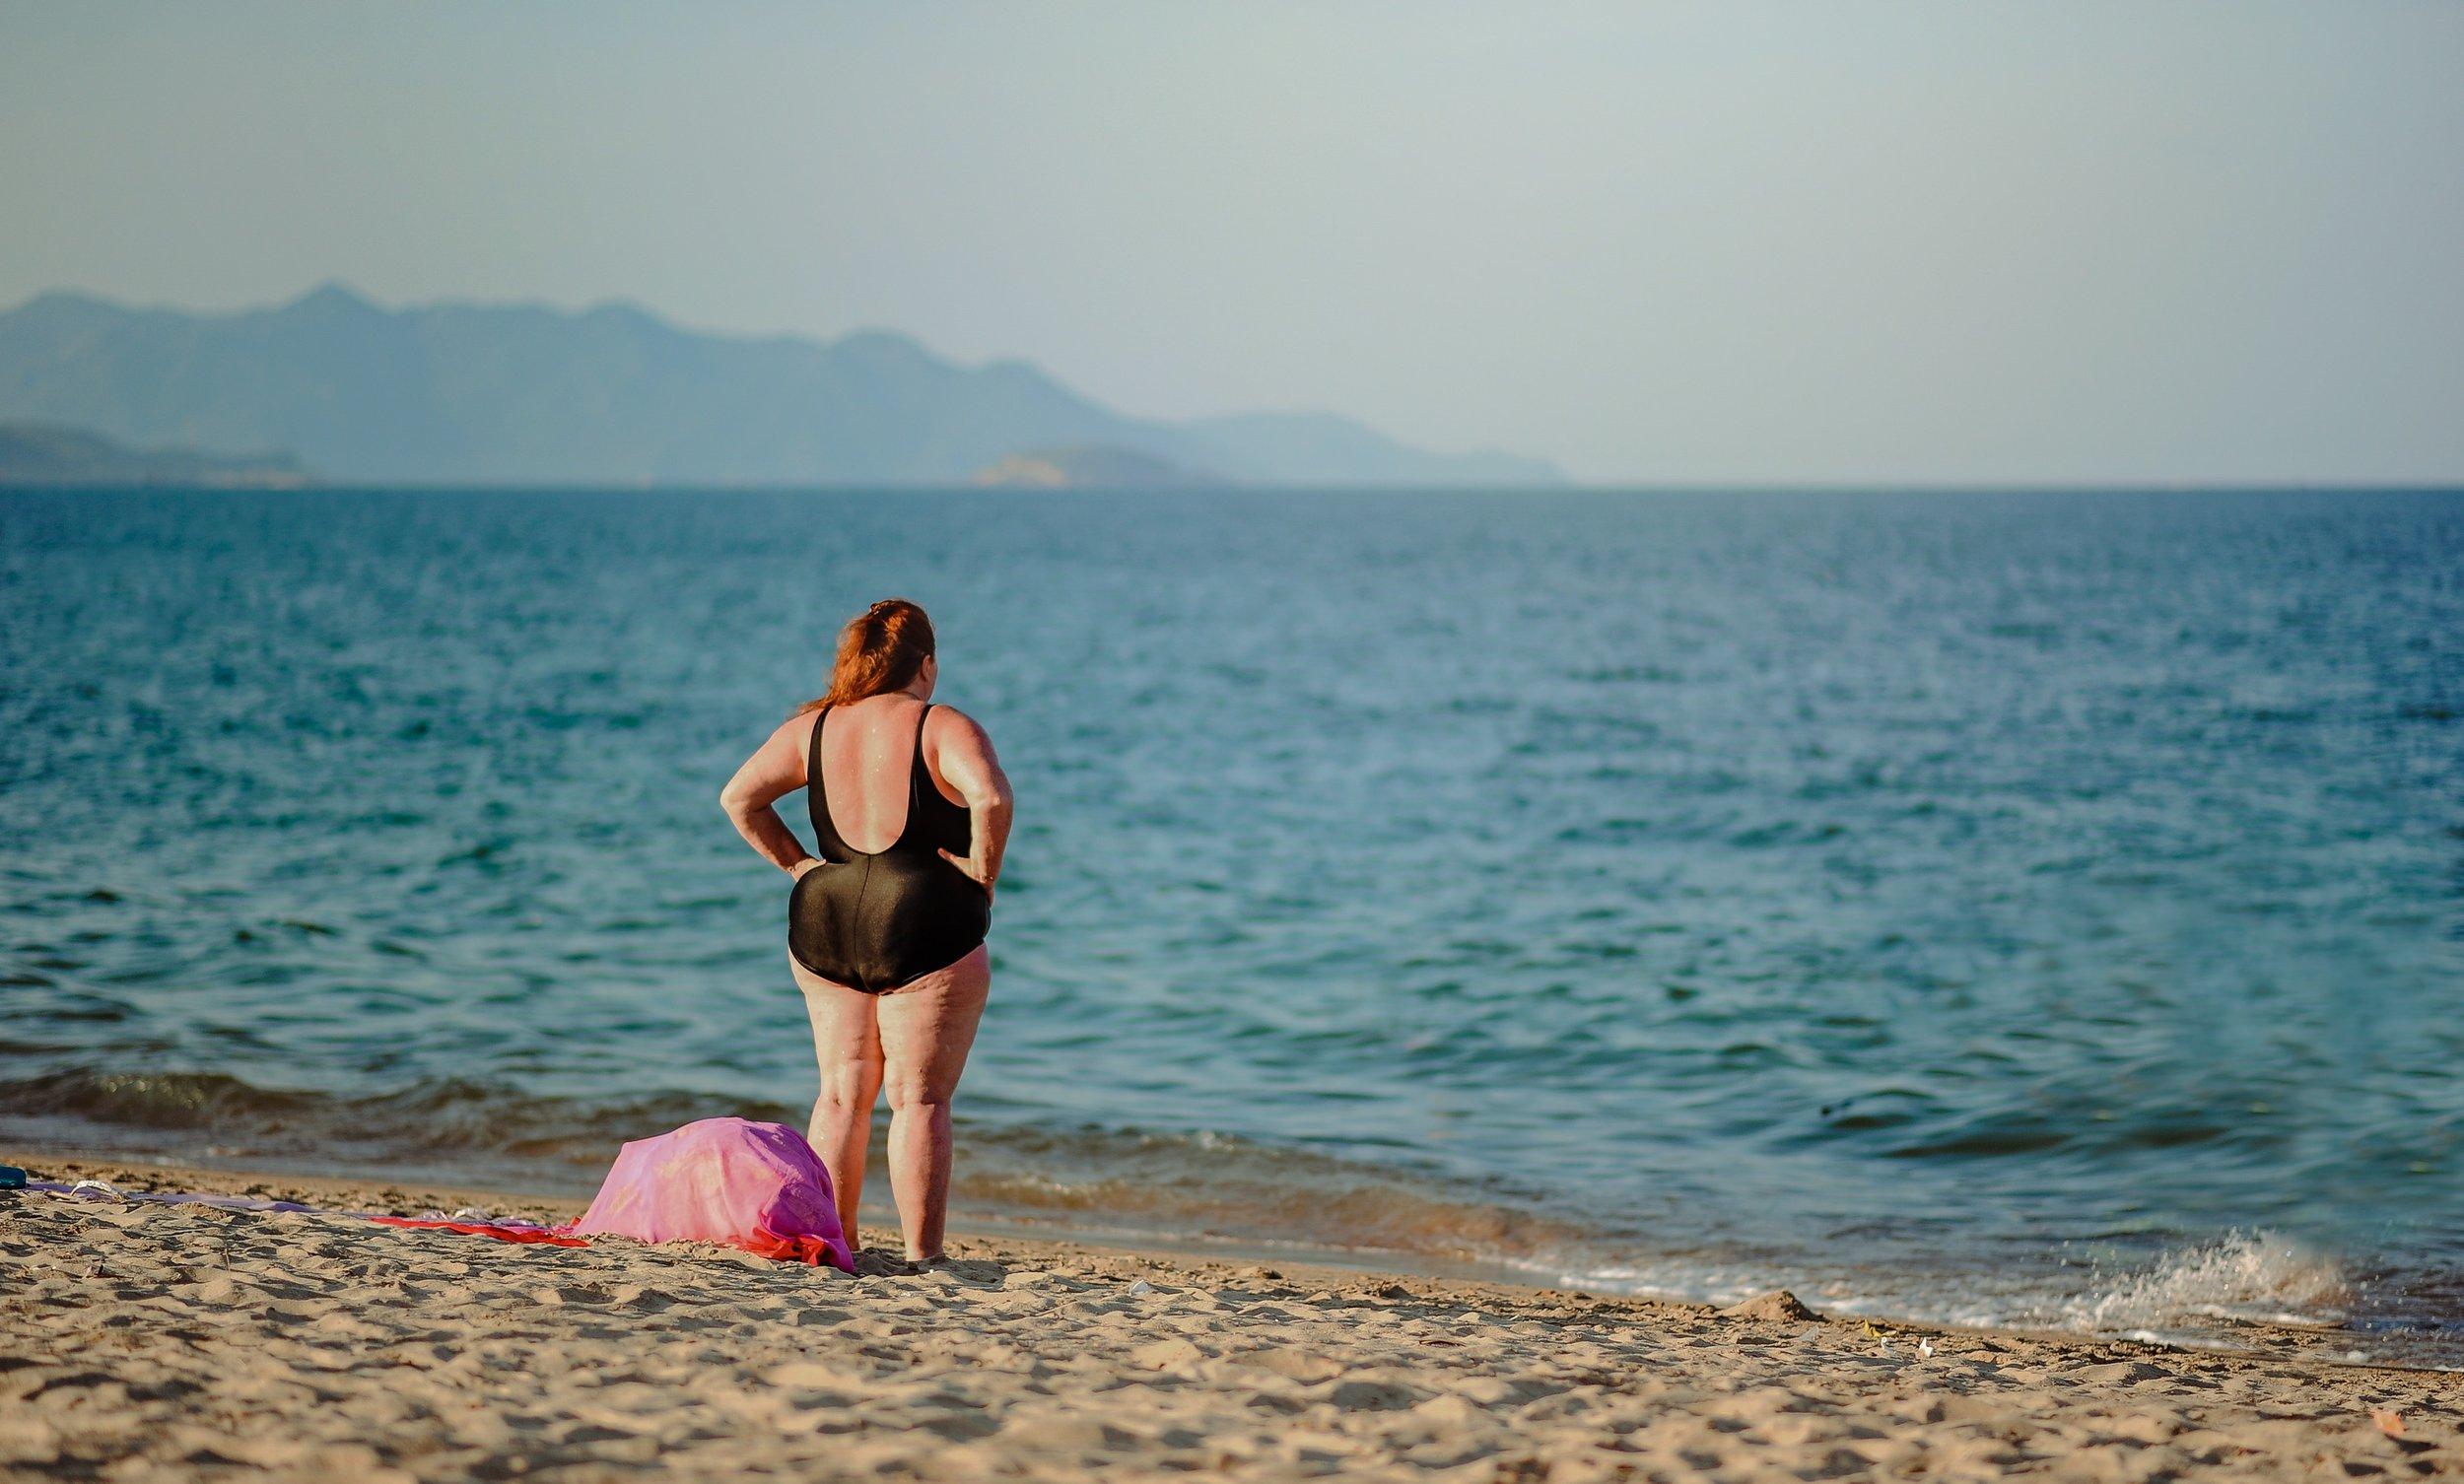 beach-beautiful-free-801616.jpg